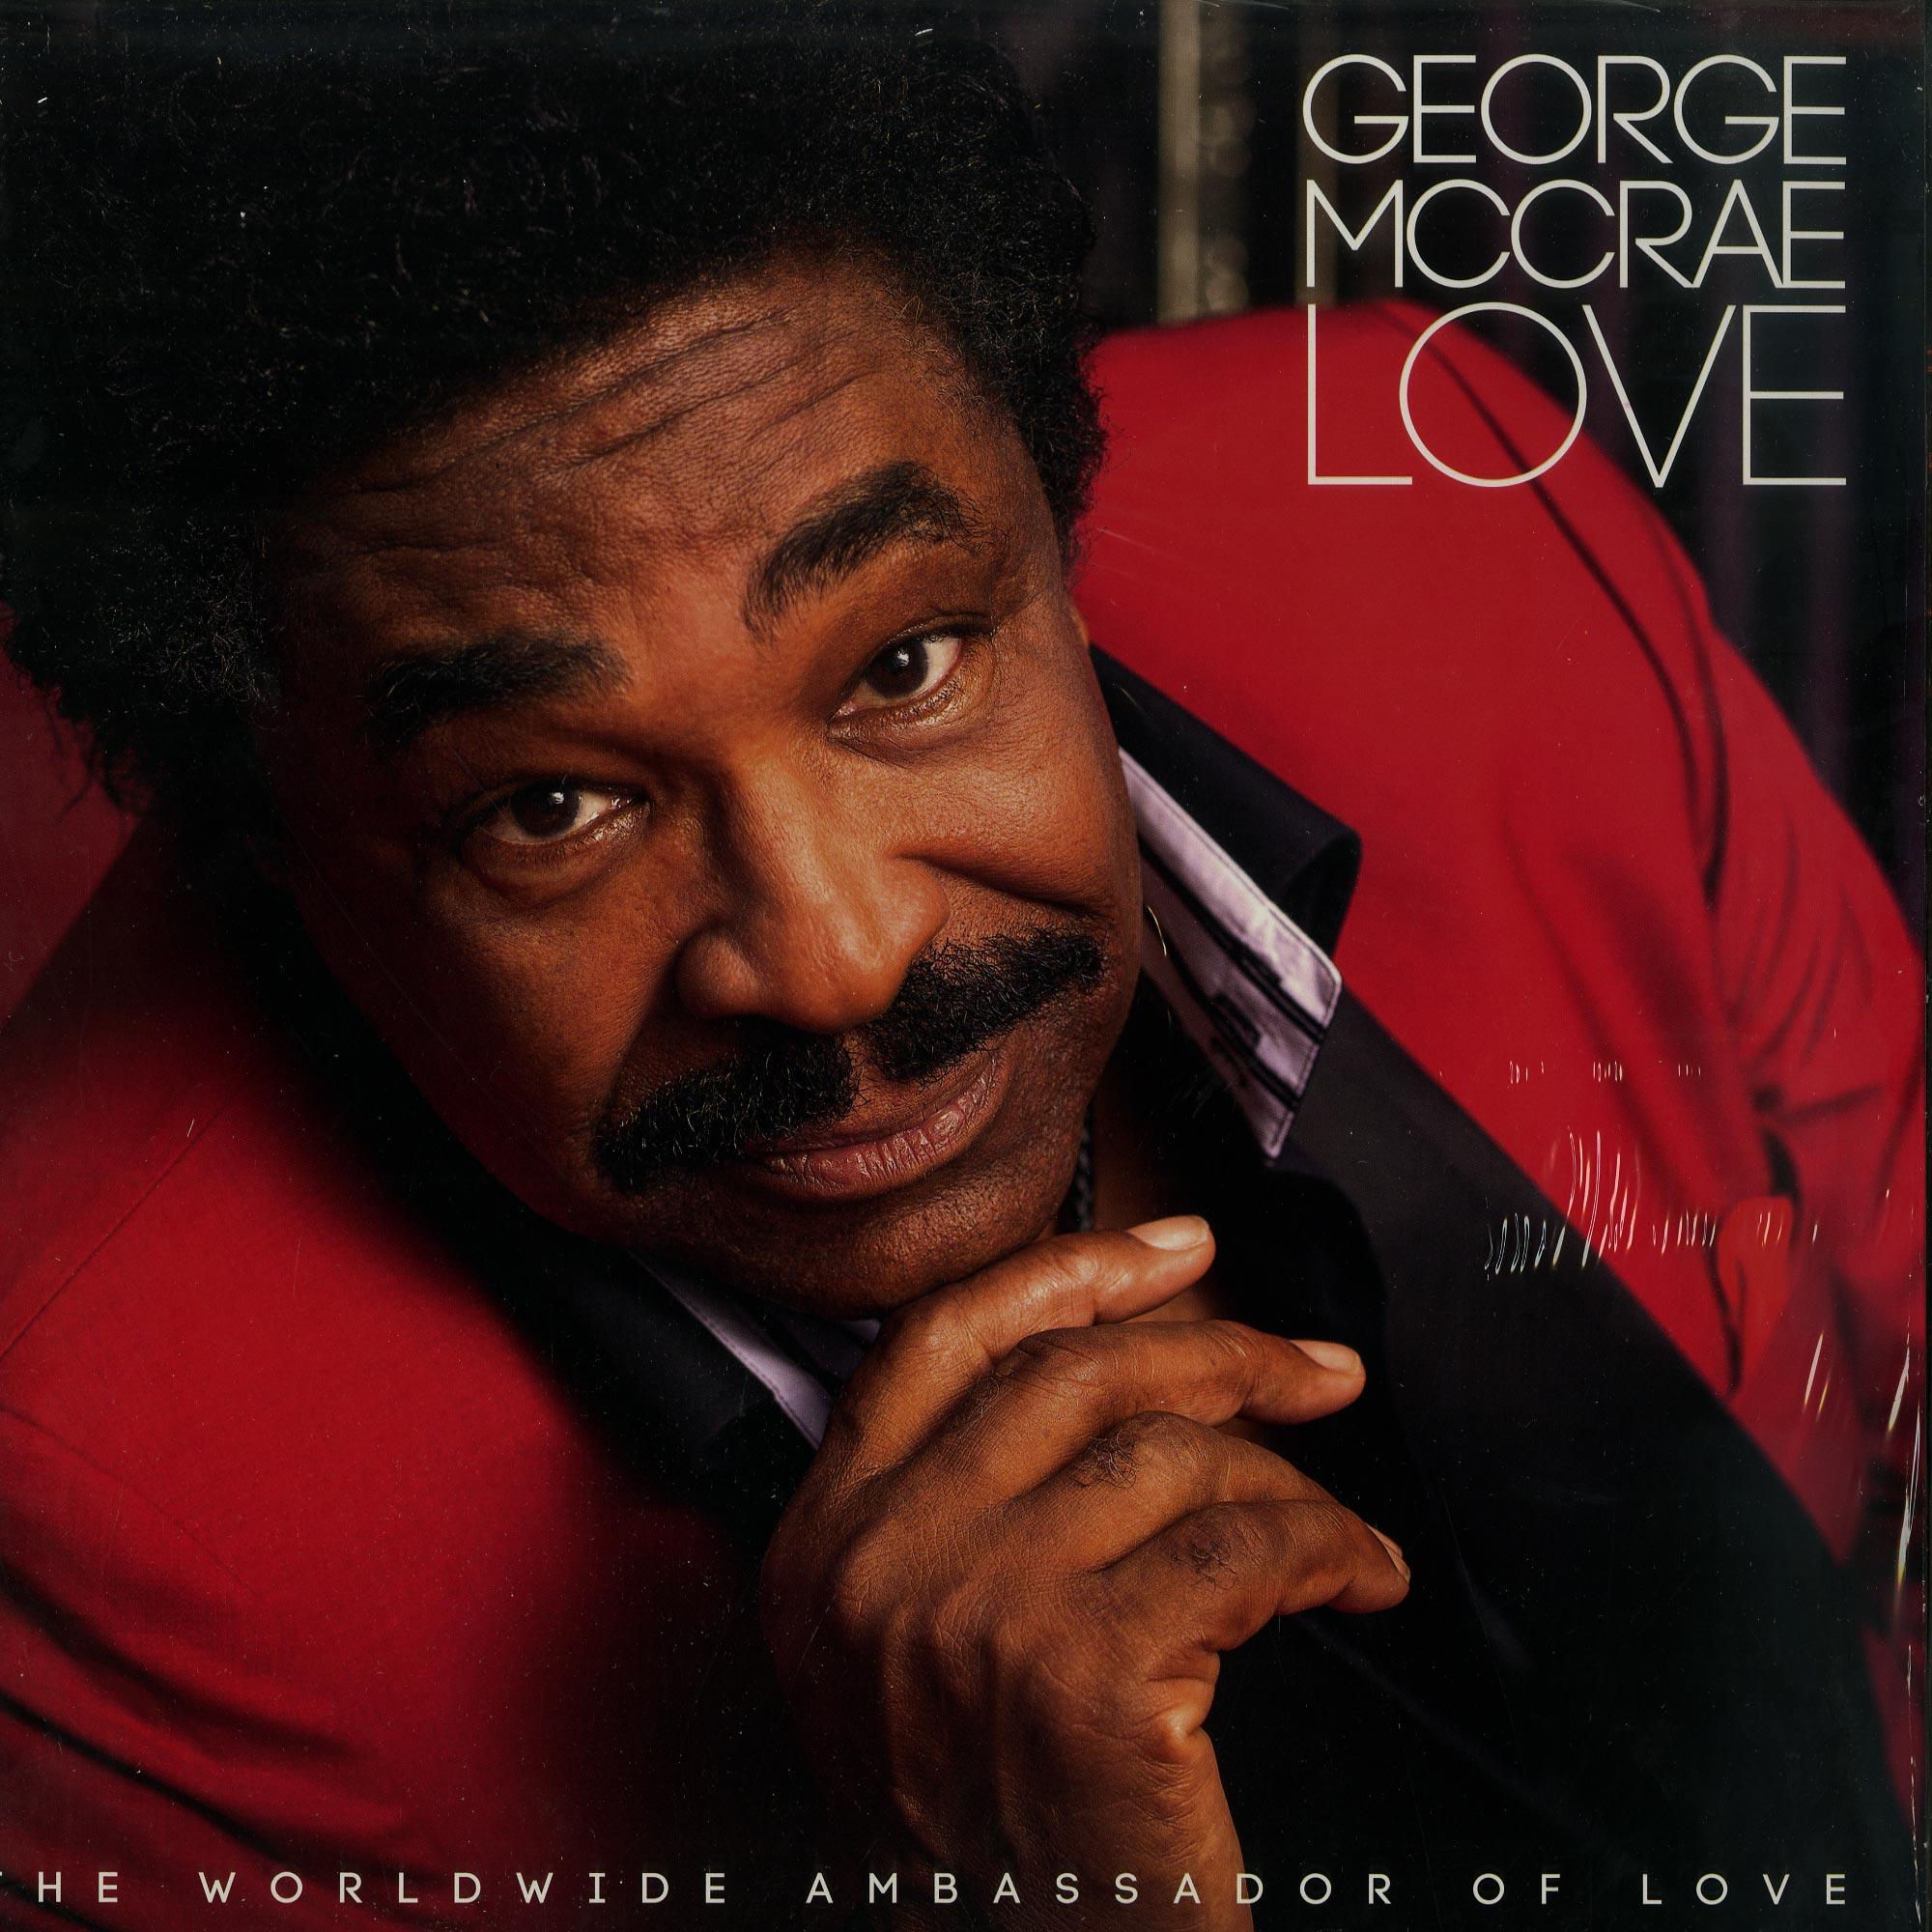 George McCrae - LOVE